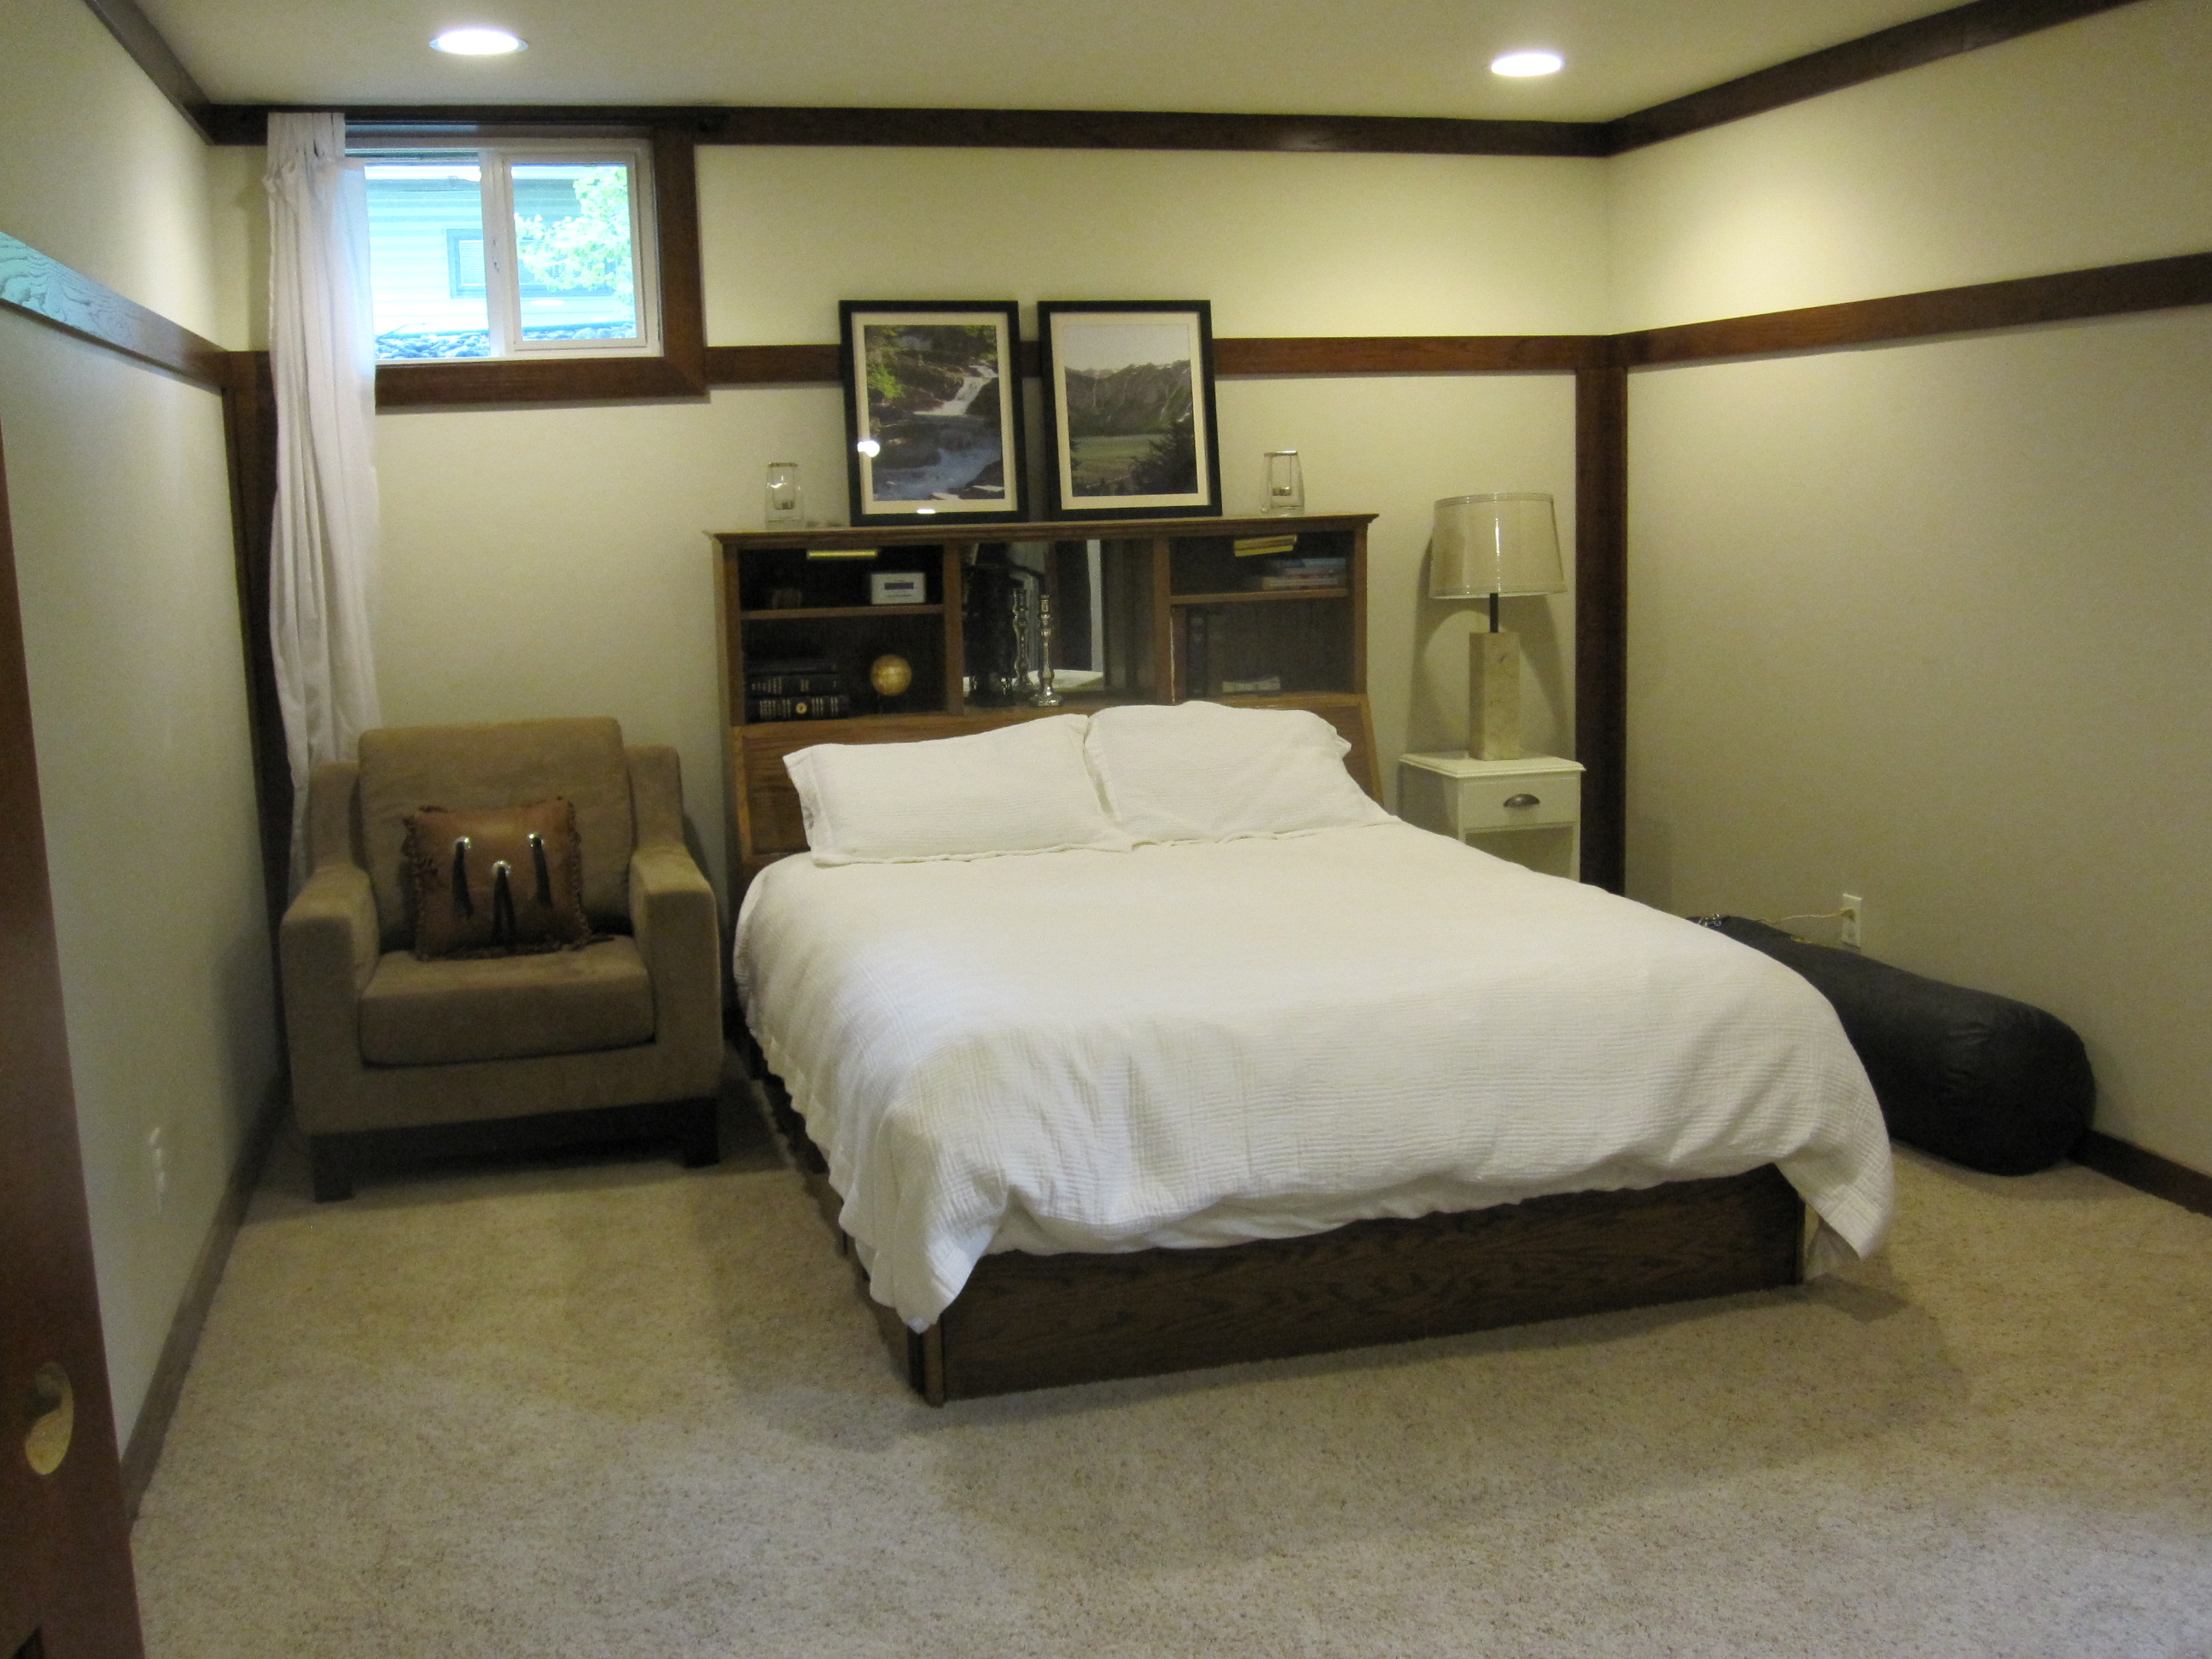 Basement Bedroom basement progress: large bedroom